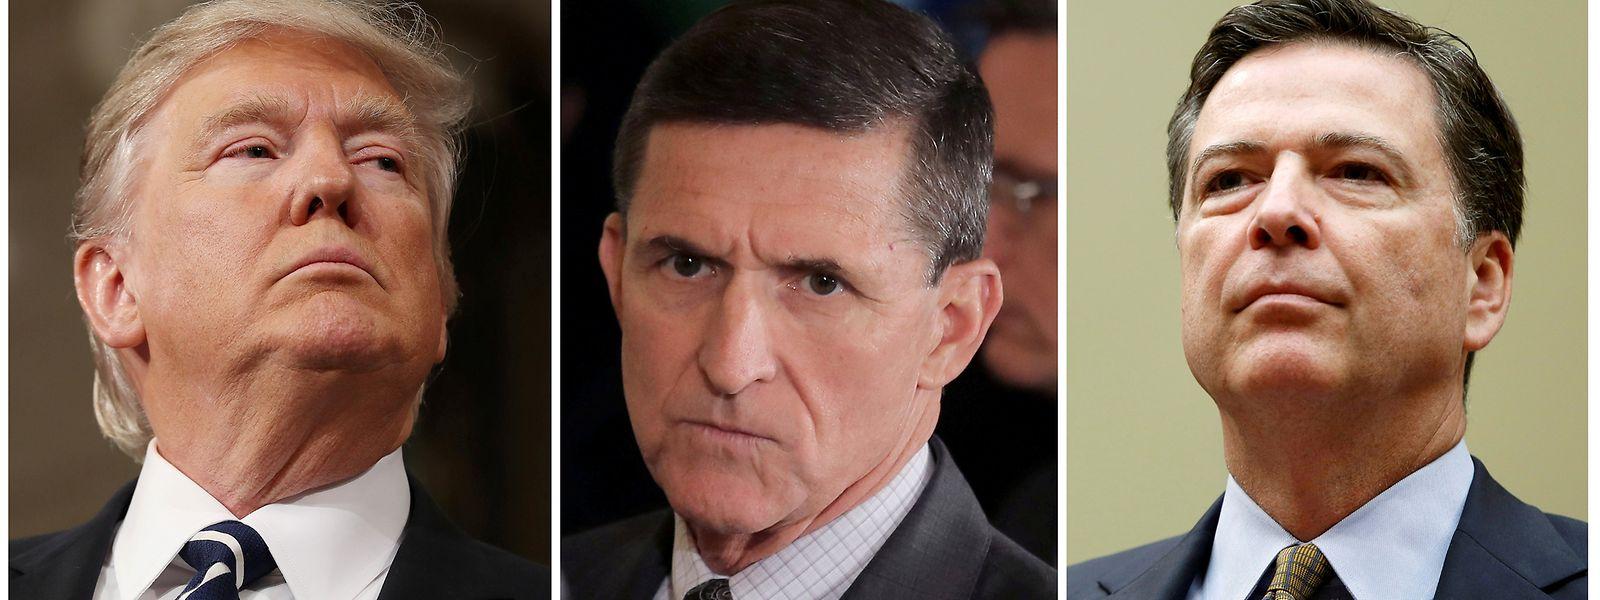 Trump, Ex-Sicherheitsberater Flynn und Ex-FBI-Chef Comey (v.l.n.r.).